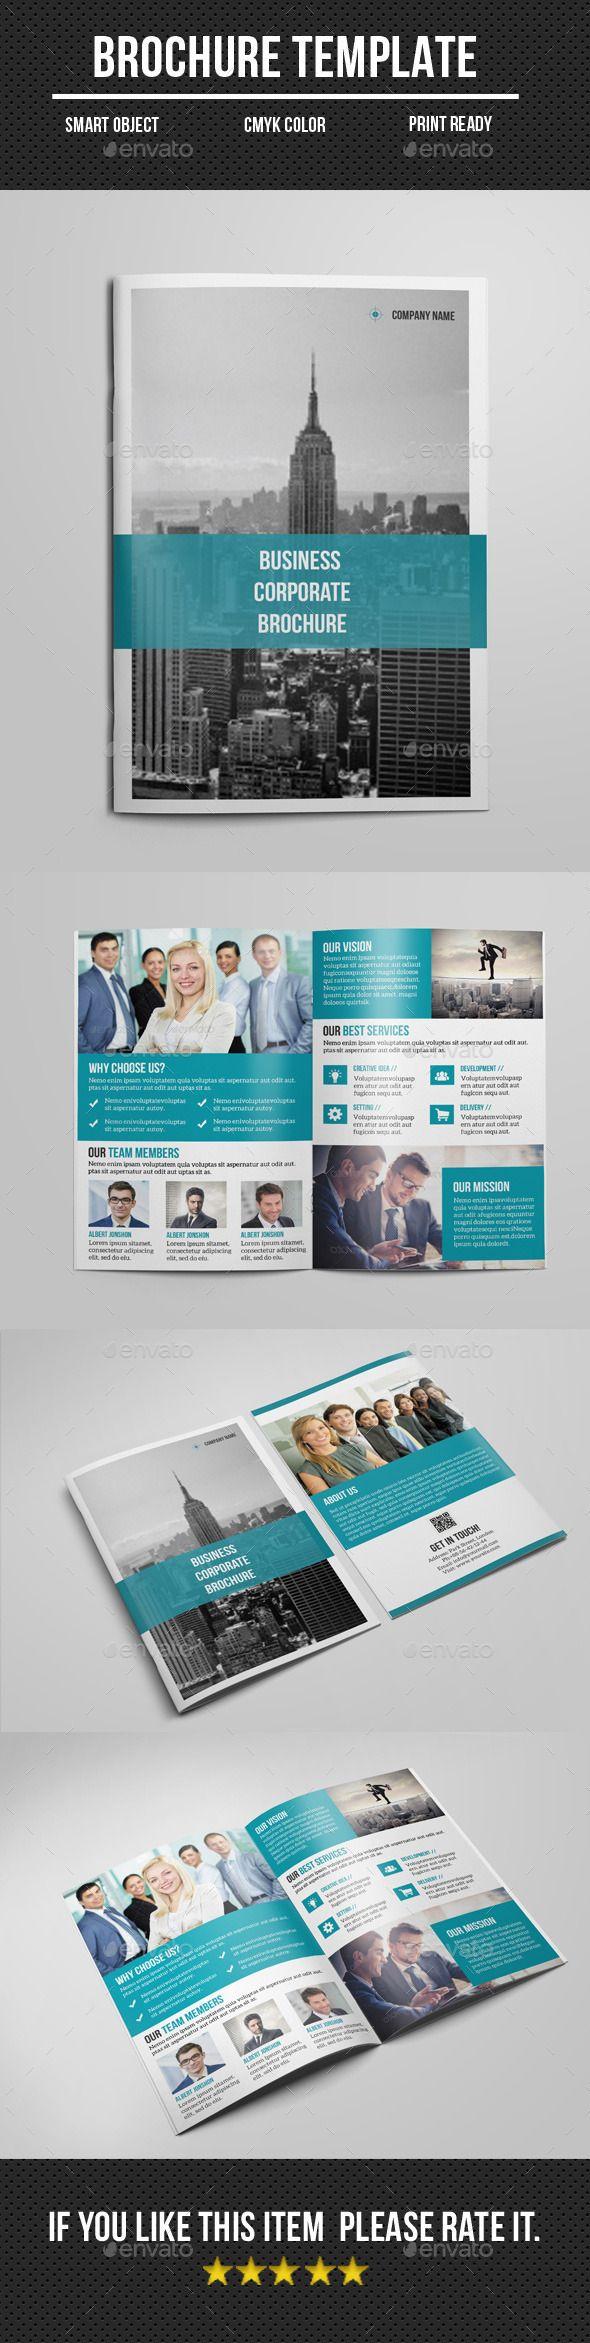 Corporate Bi- Fold Brochure Template #design #printdesign Download: http://graphicriver.net/item/corporate-bi-fold-brochure/12105215?ref=ksioks